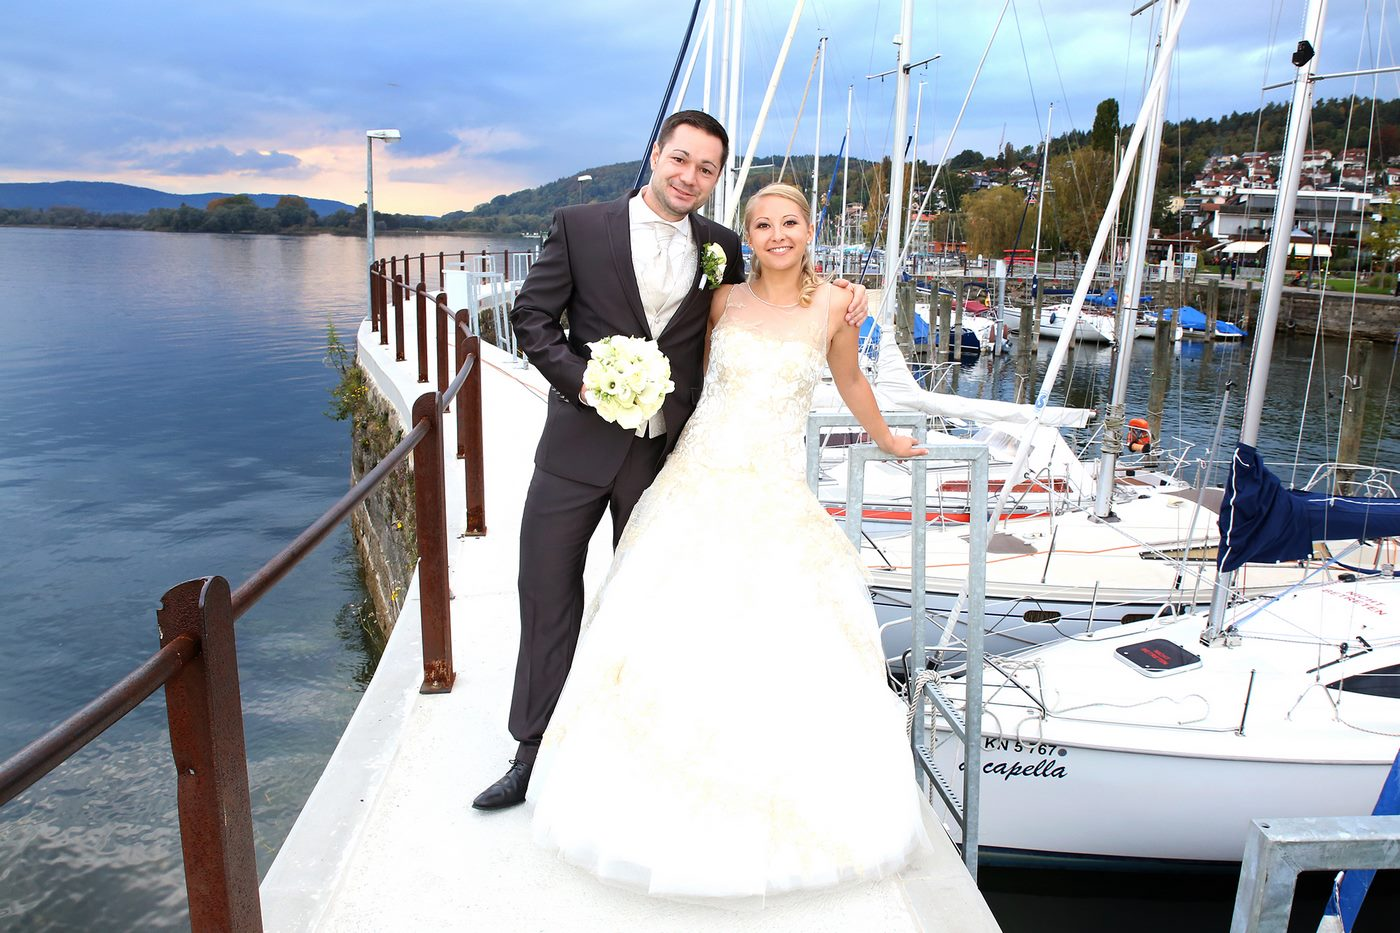 Brautpaar auf Bootssteg am Bodensee fotografiert